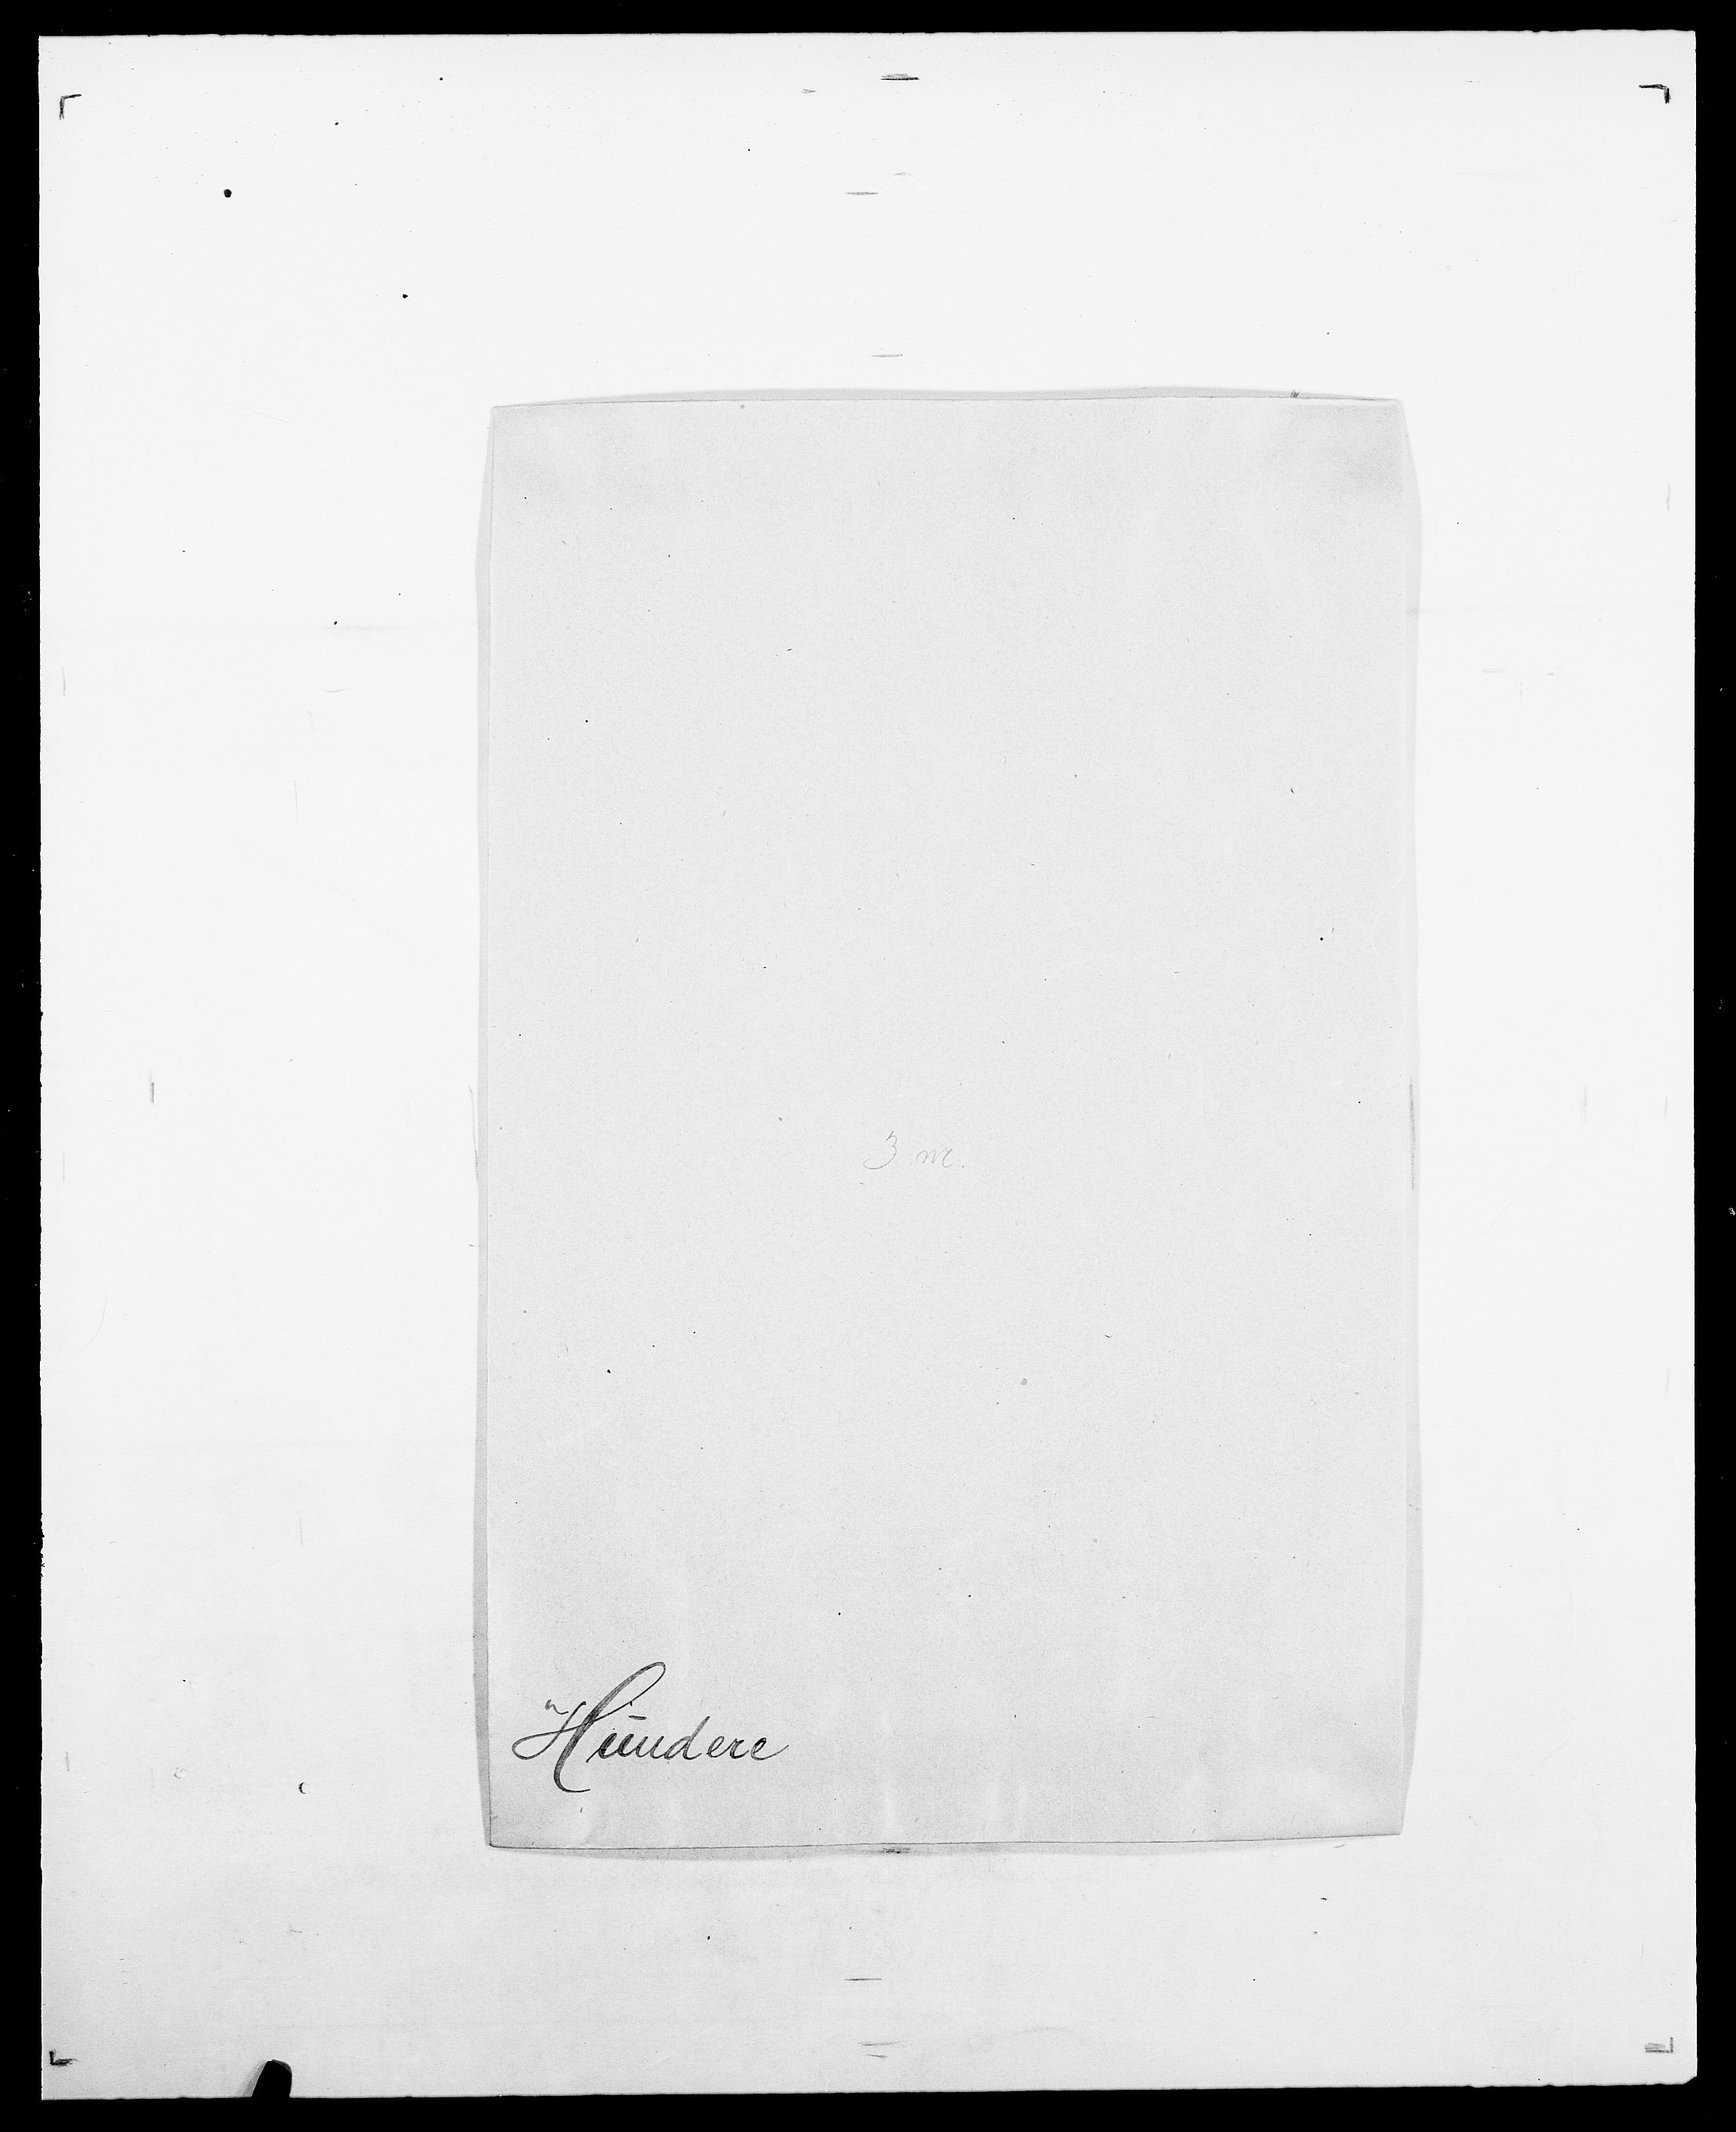 SAO, Delgobe, Charles Antoine - samling, D/Da/L0019: van der Hude - Joys, s. 60